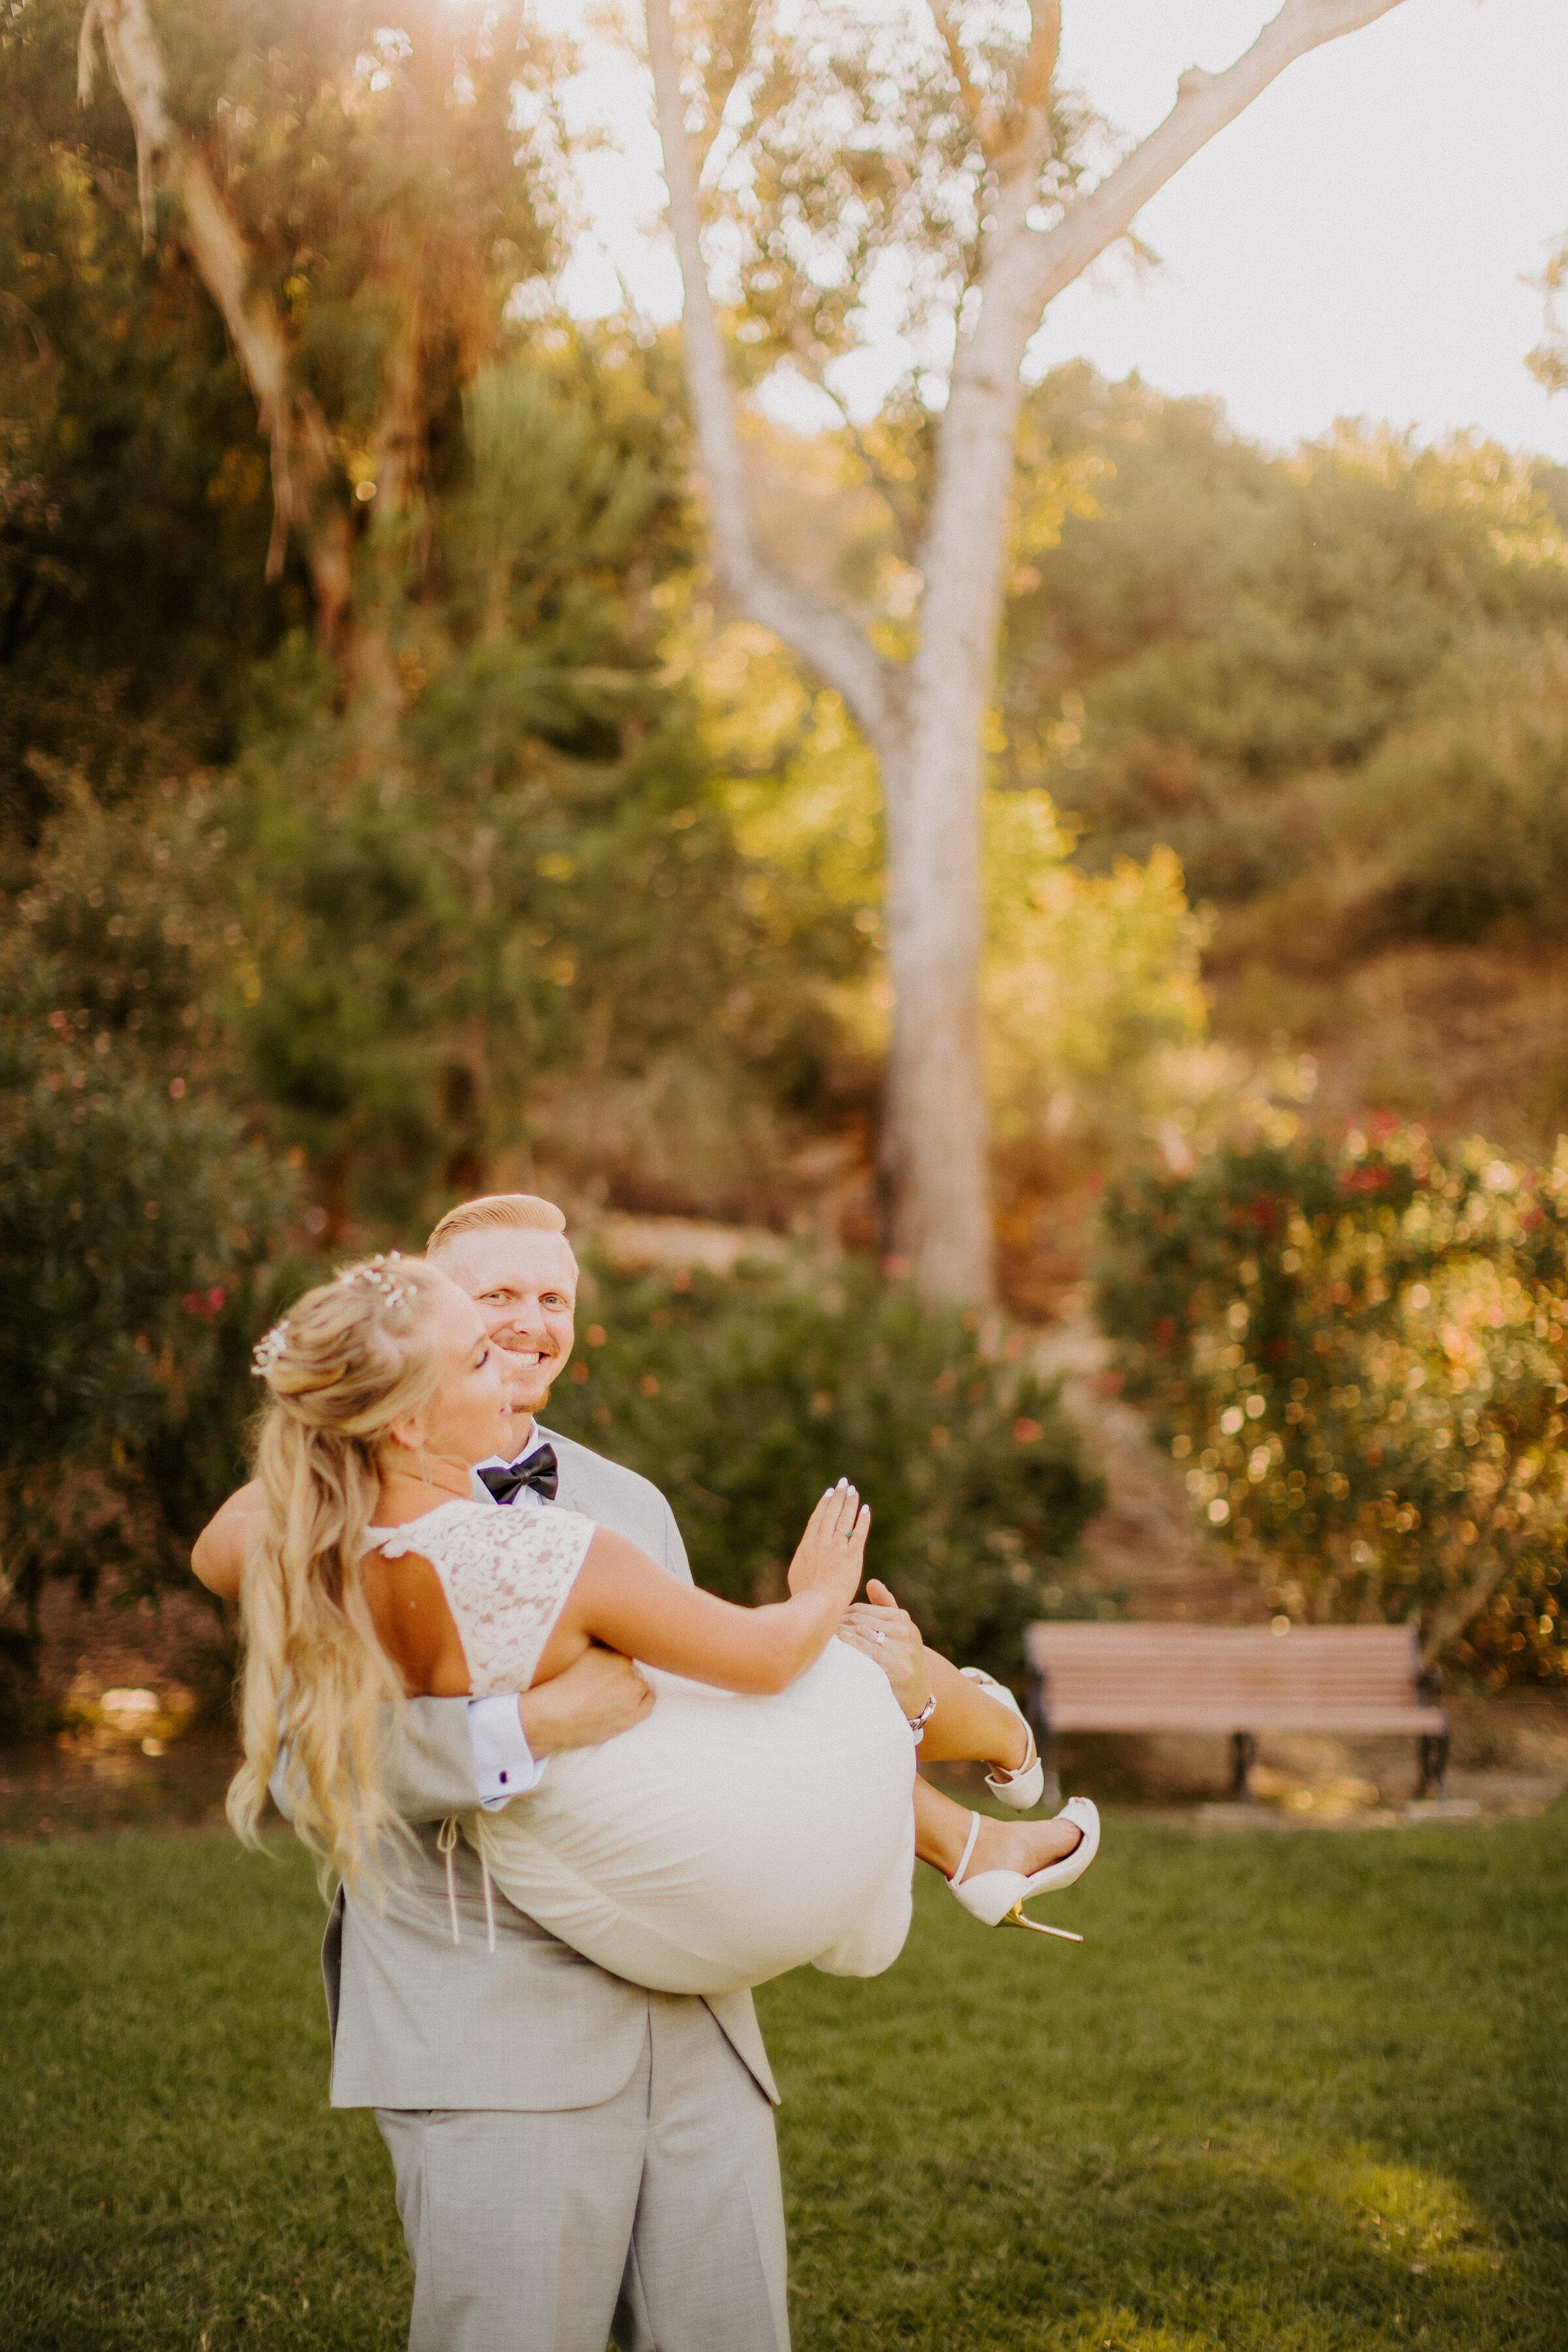 amphoto kj vowel renewal bridals-114.jpg